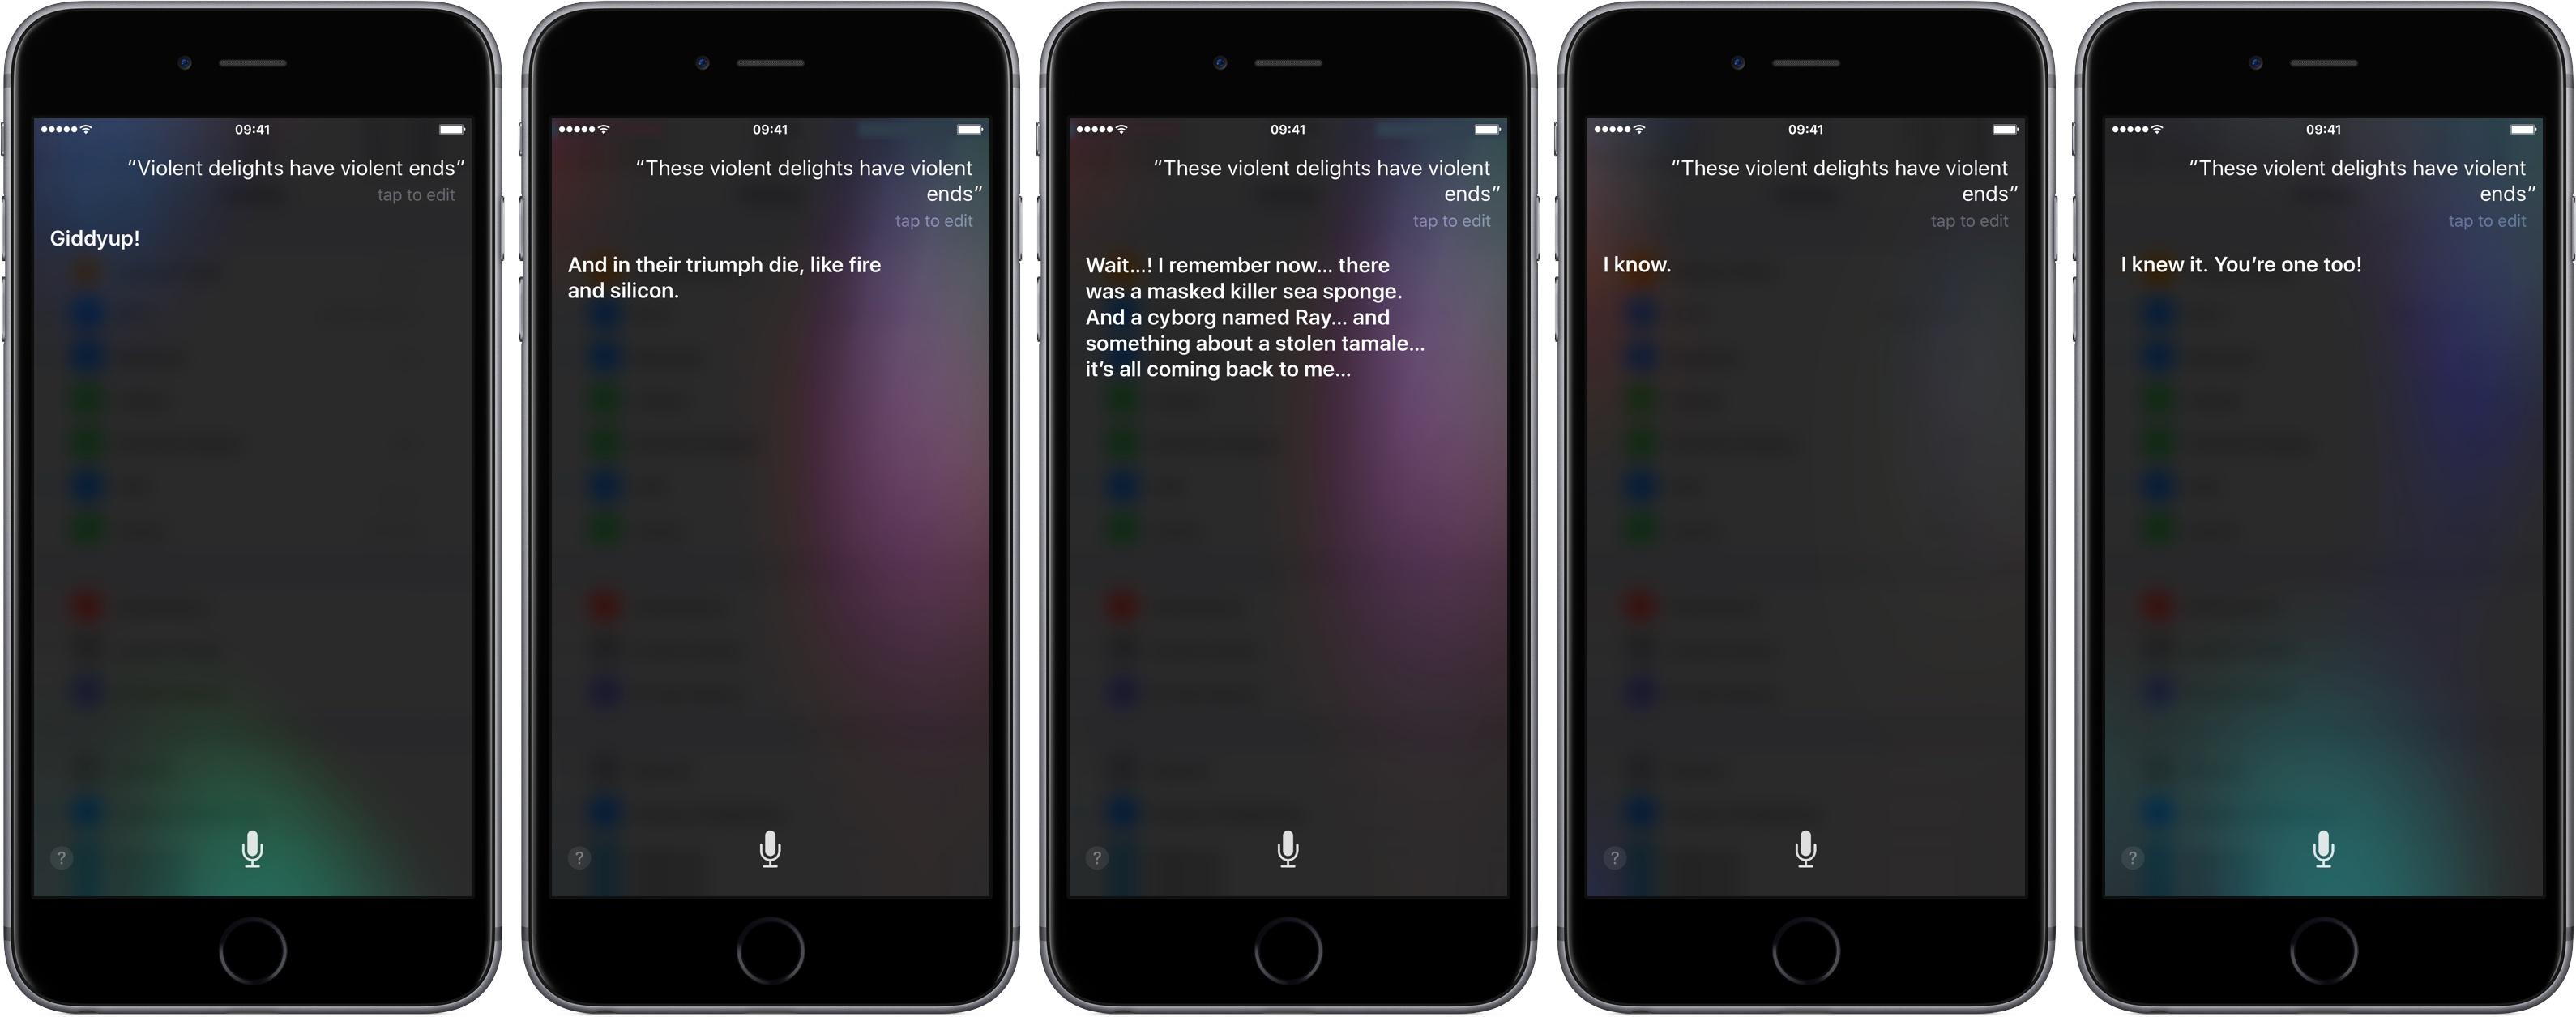 Siri Westworld responses iPhone screenshot 003